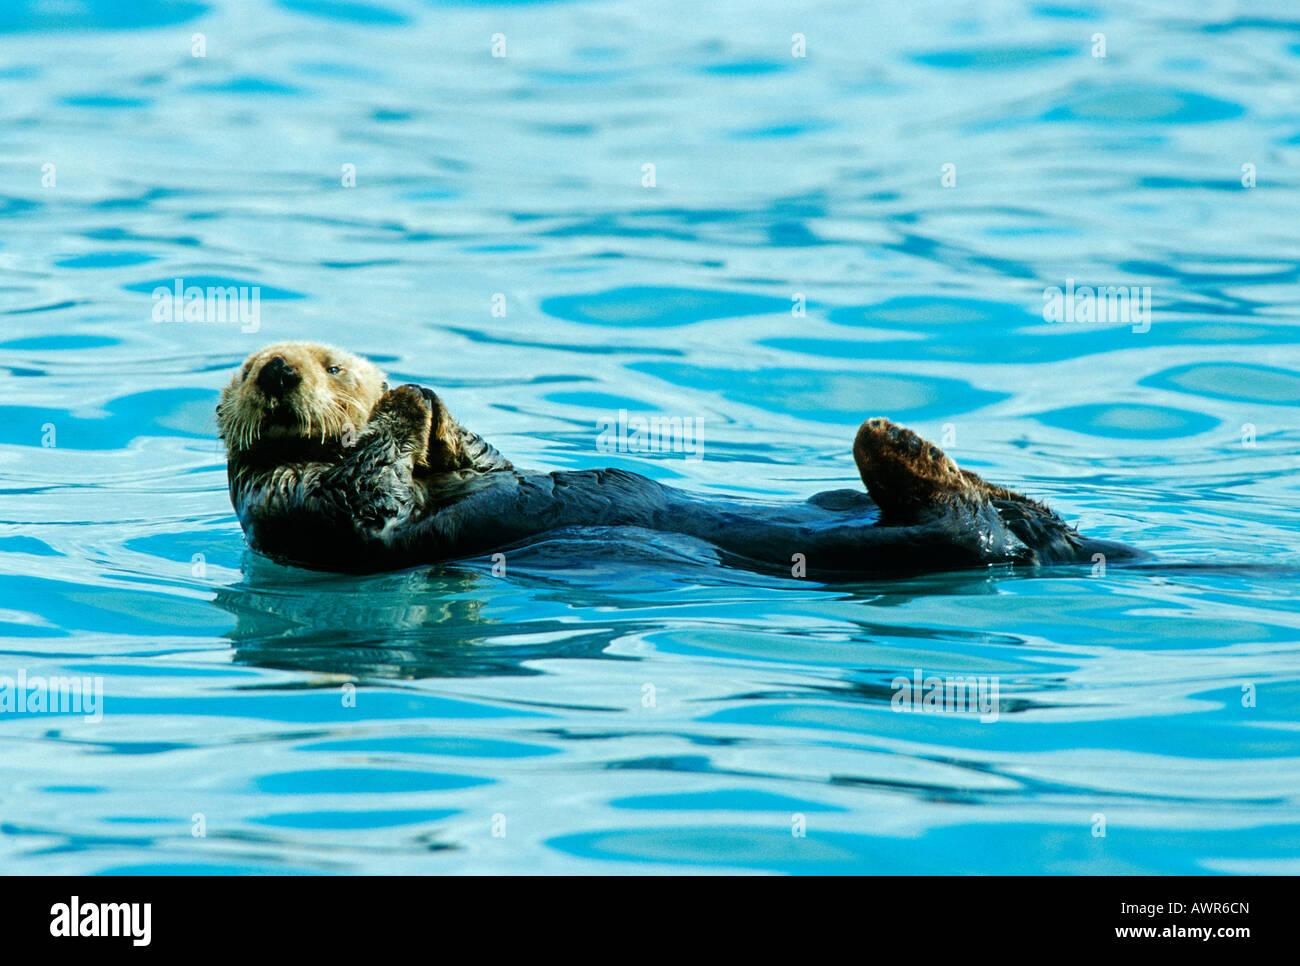 Sea Otter, Prince William Sound, Alaska, USA Stock Photo